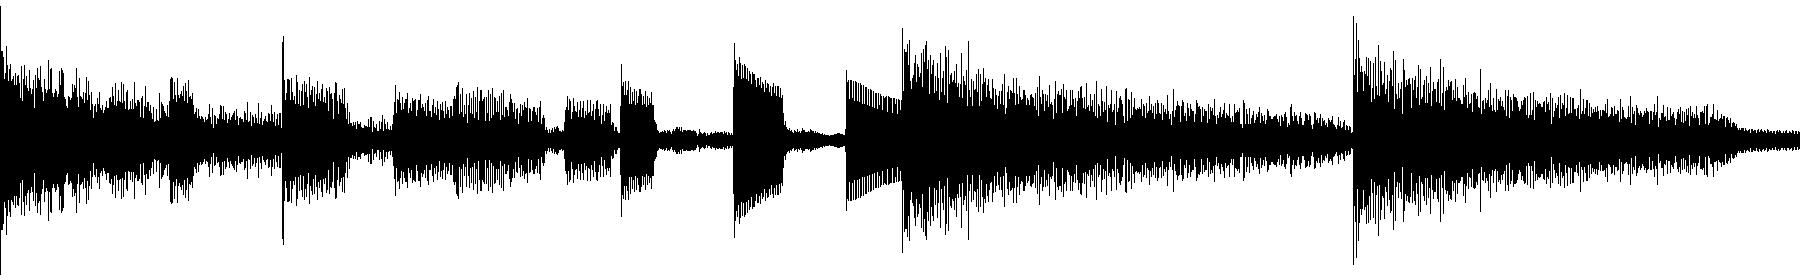 Rhodes piano chords | Sample Focus